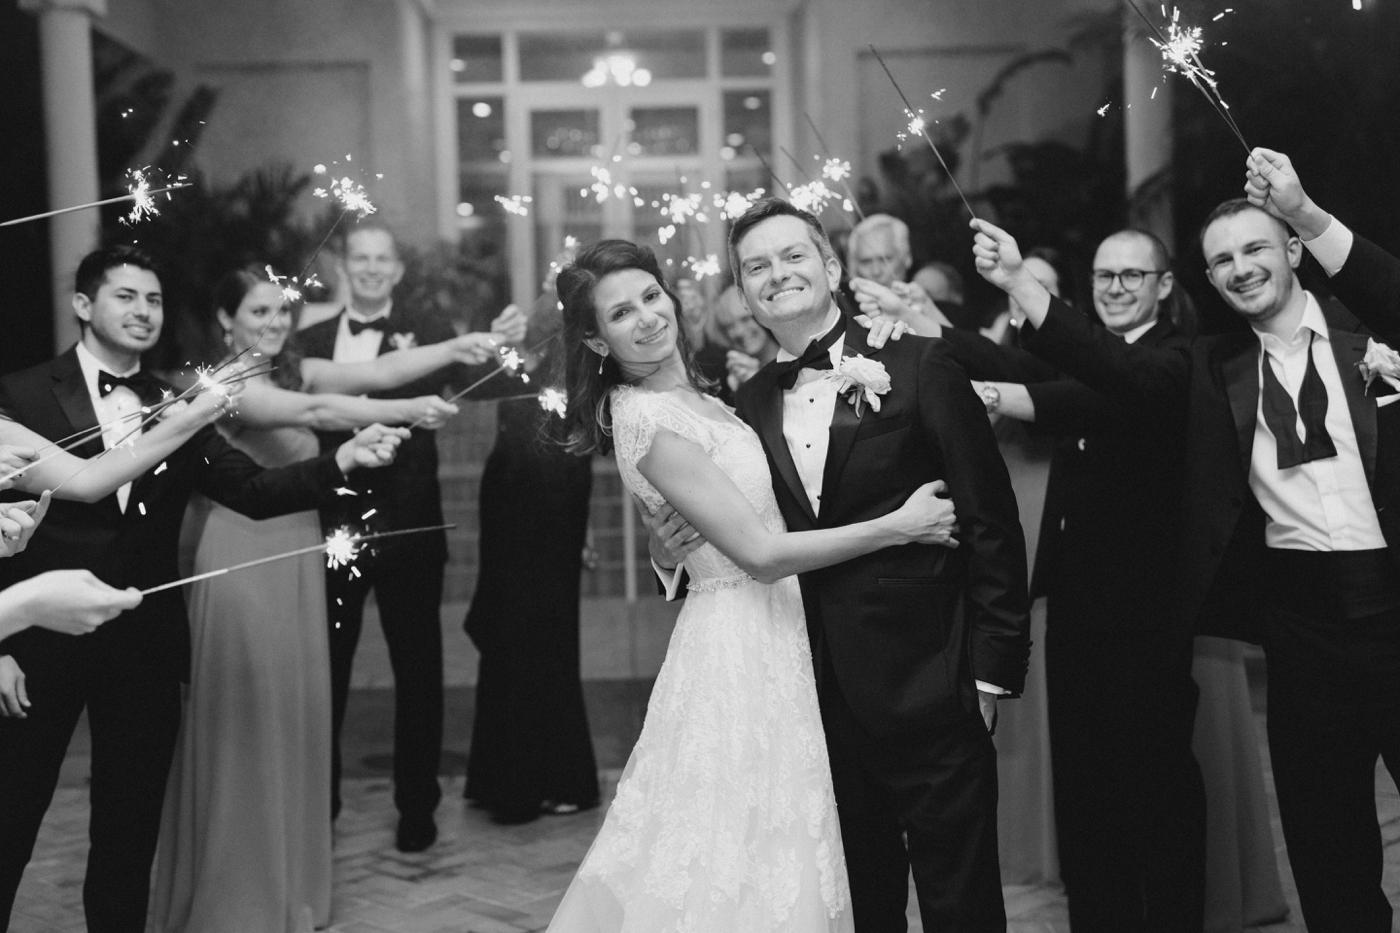 wedding exit photography